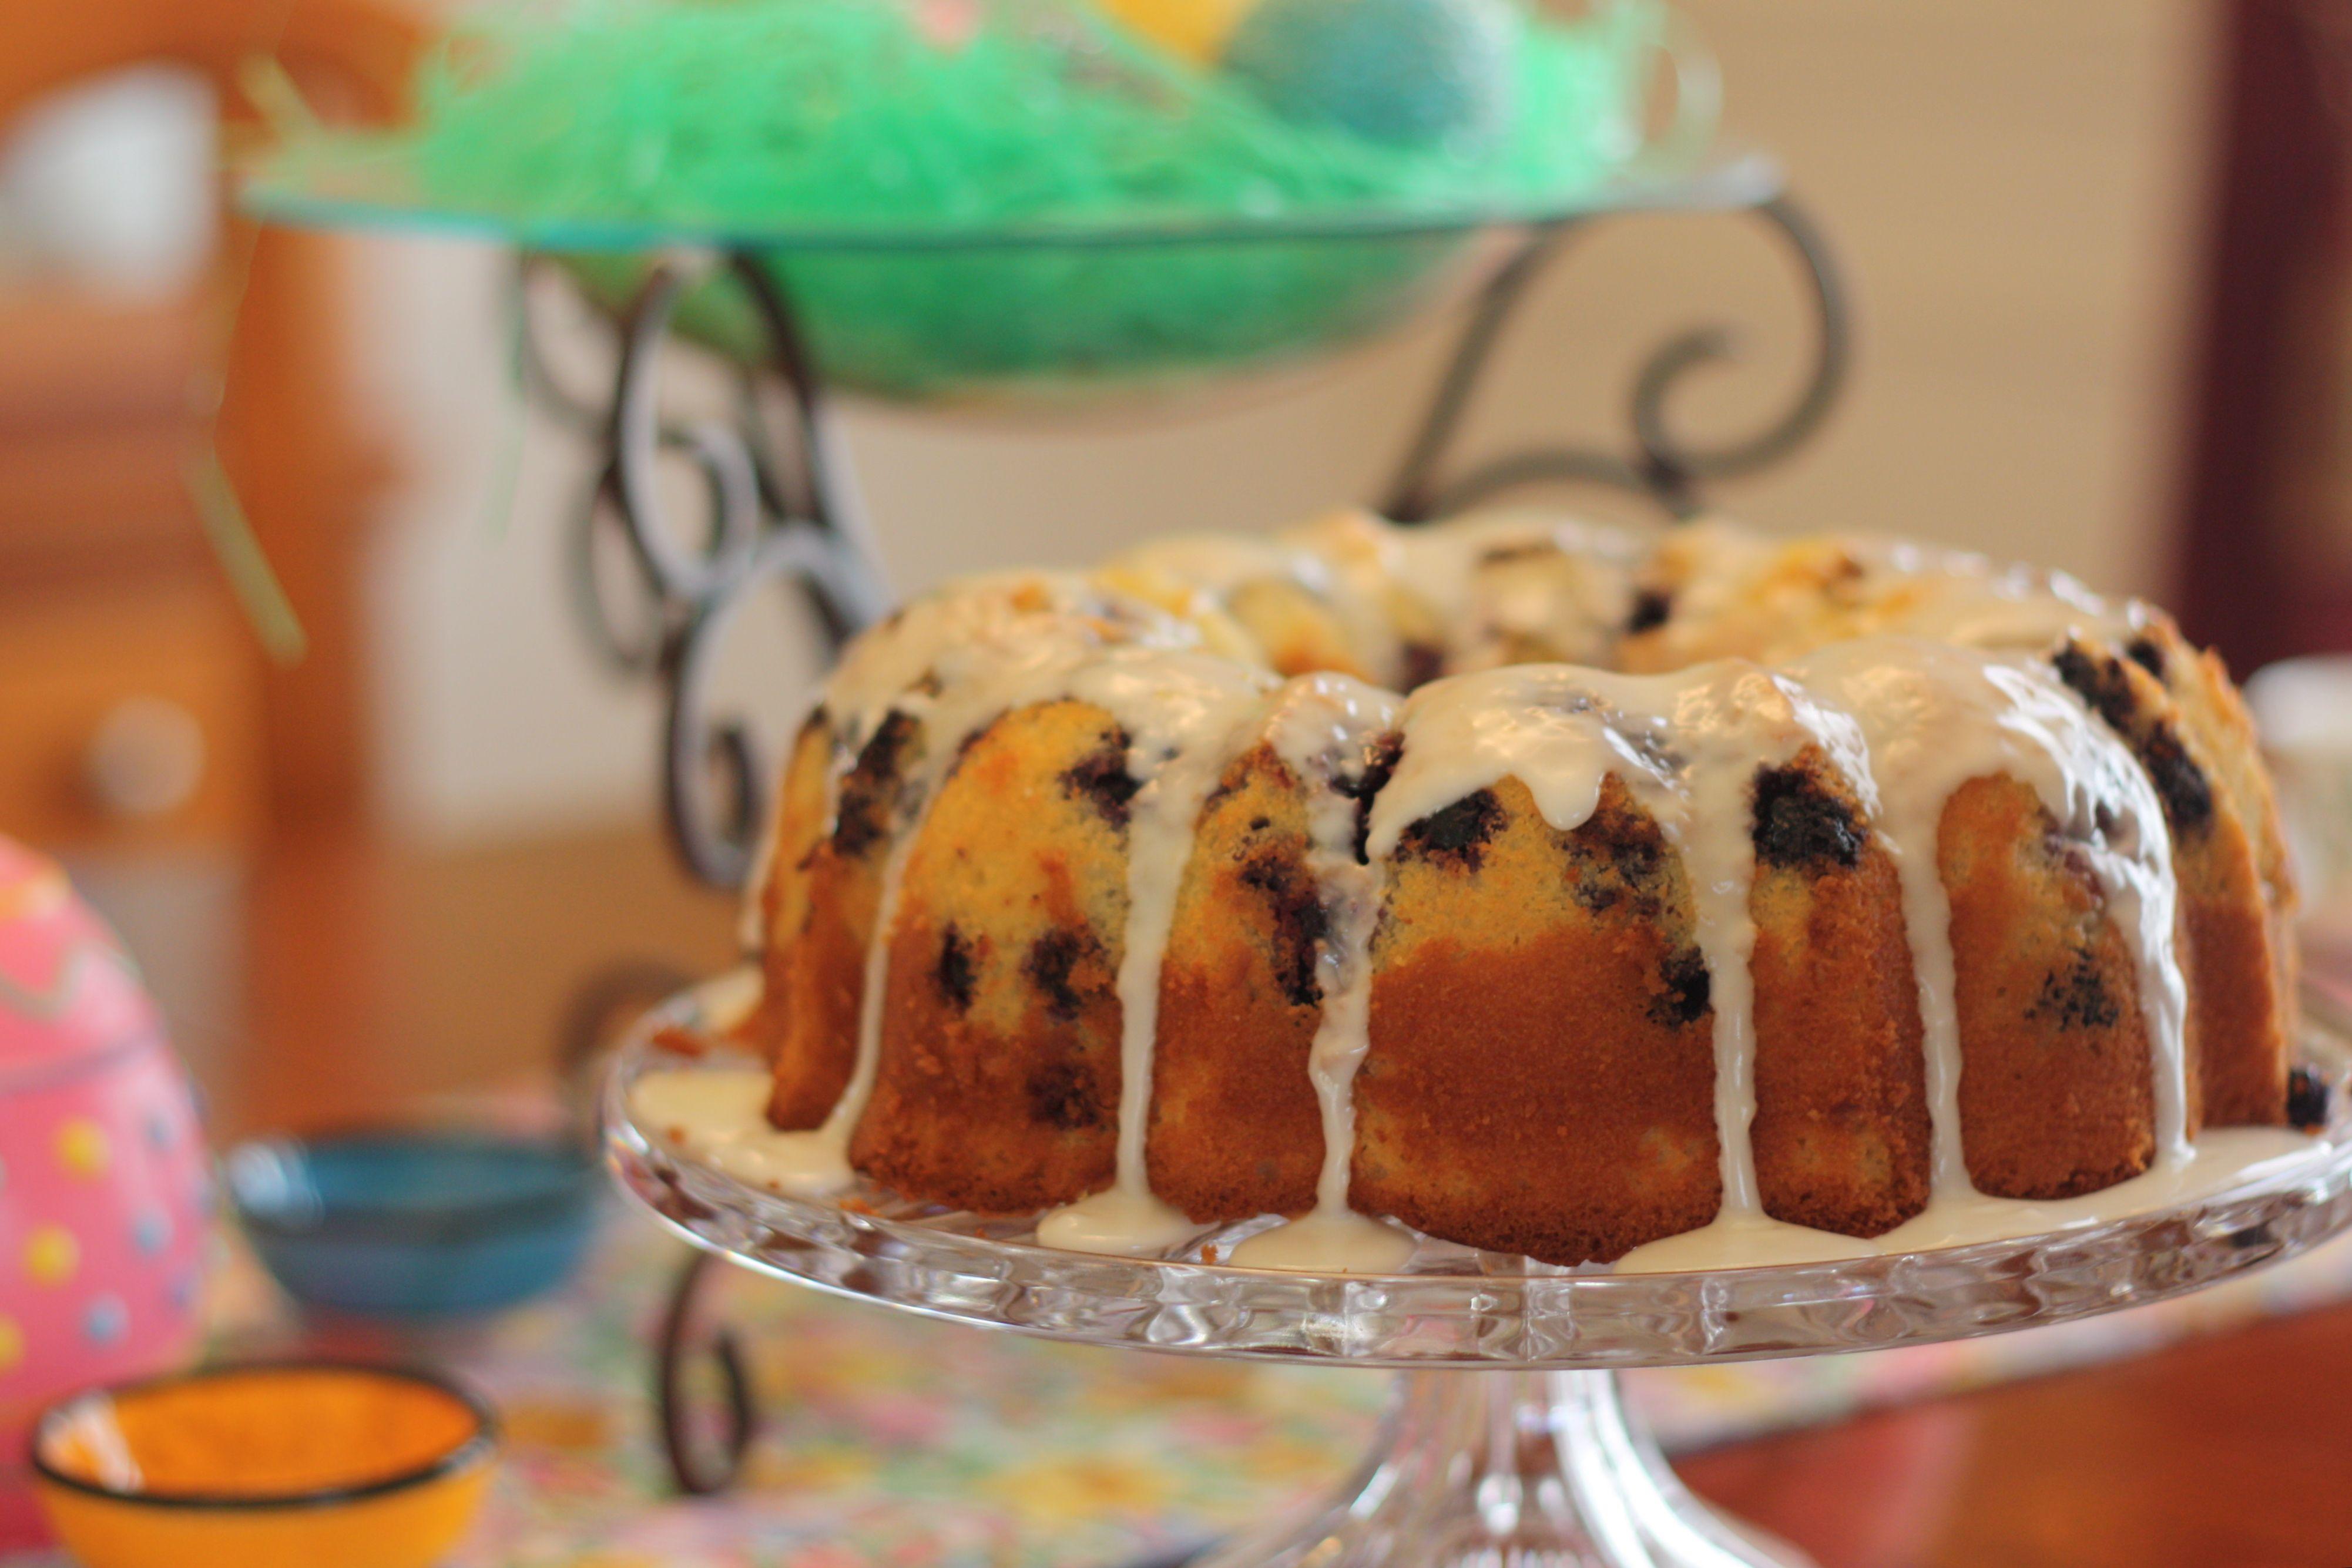 Best lemon blueberry bundt cake recipe with images